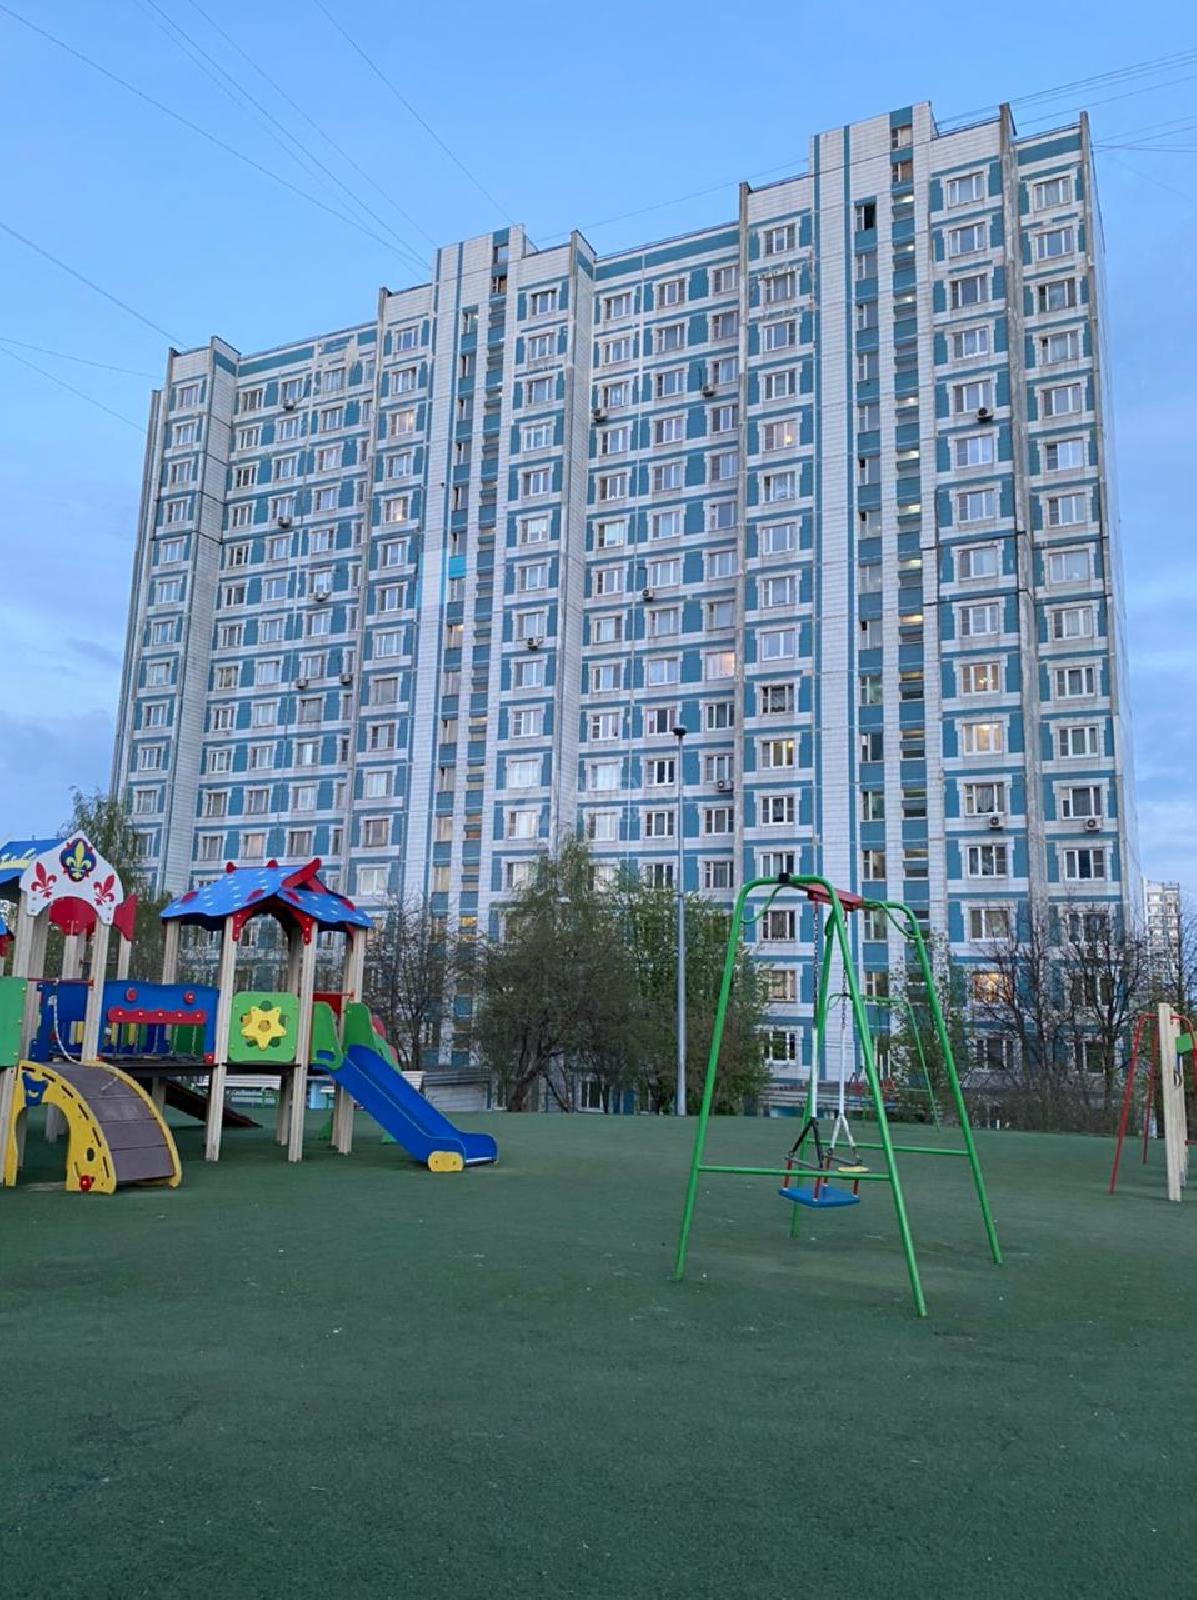 Фото №2 - 2-комнатная квартира, Москва, Липецкая улица 40, метро Кантемировская